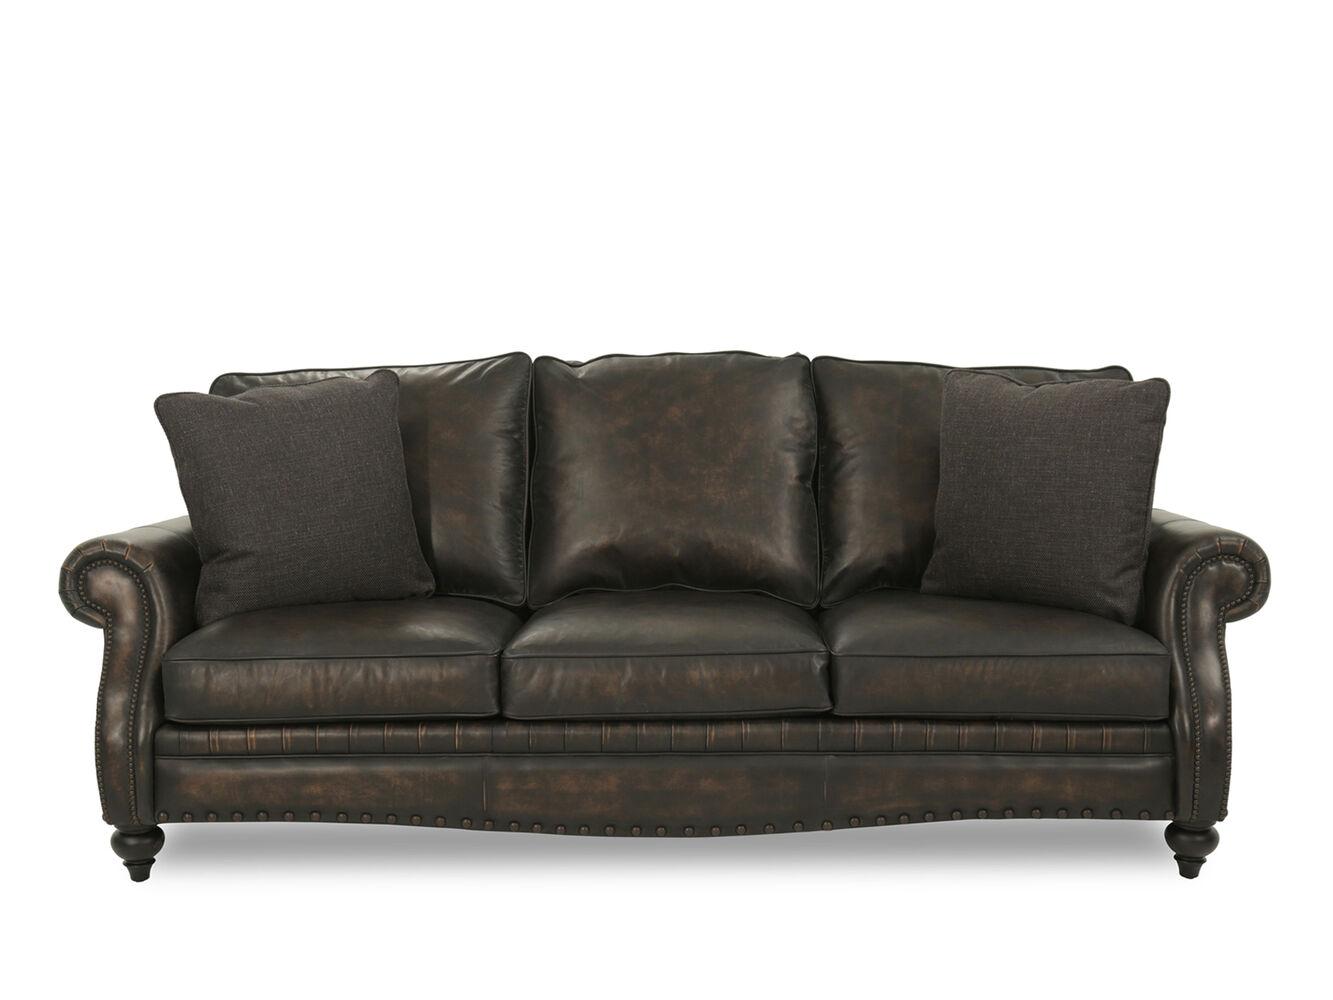 Bernhardt Tucker Leather Mocha Sofa  Mathis Brothers Furniture